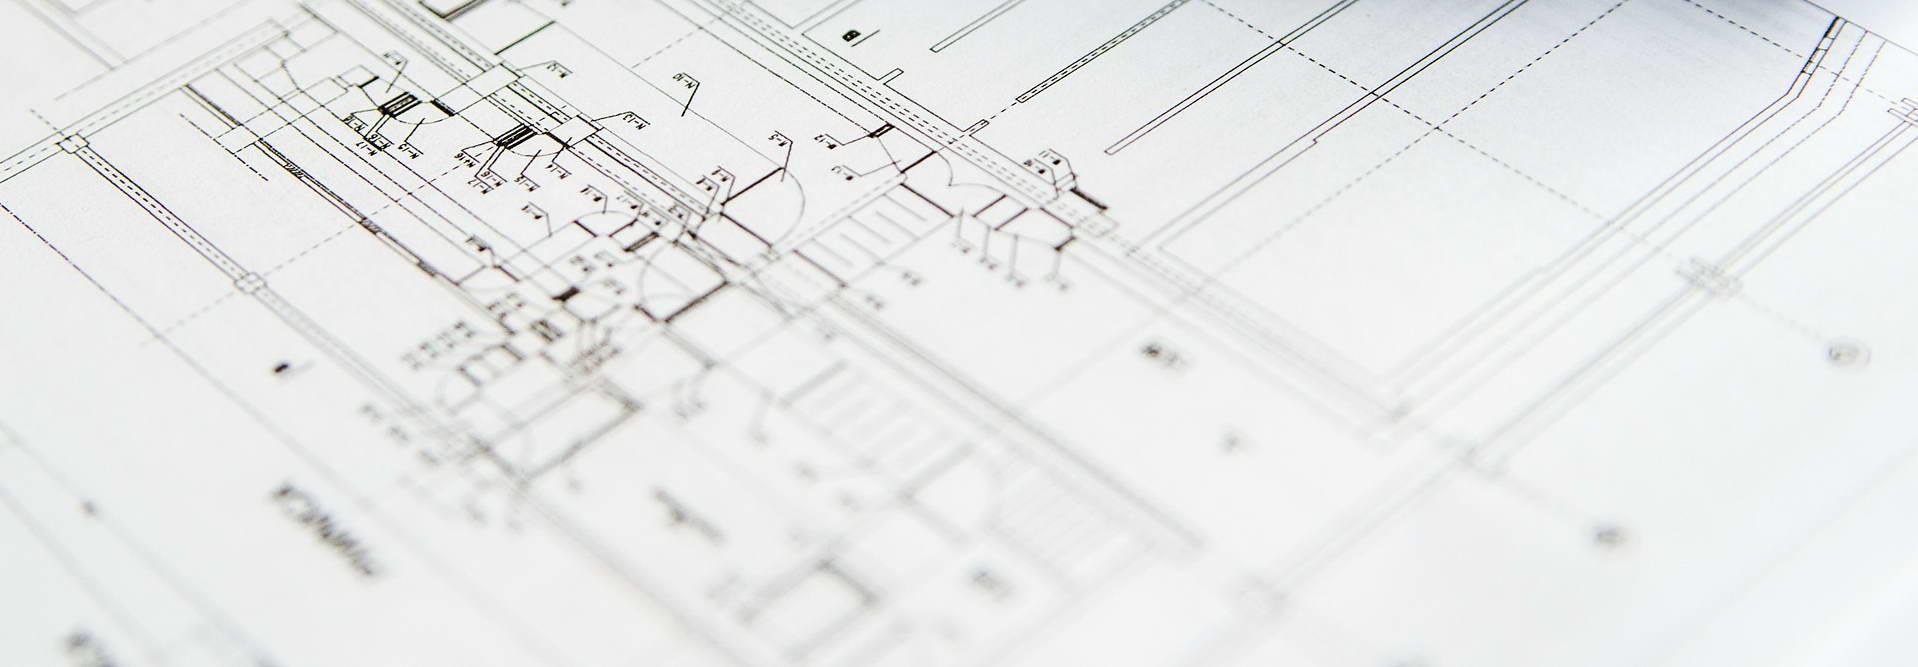 plan-tech_umovy-2017-03-21